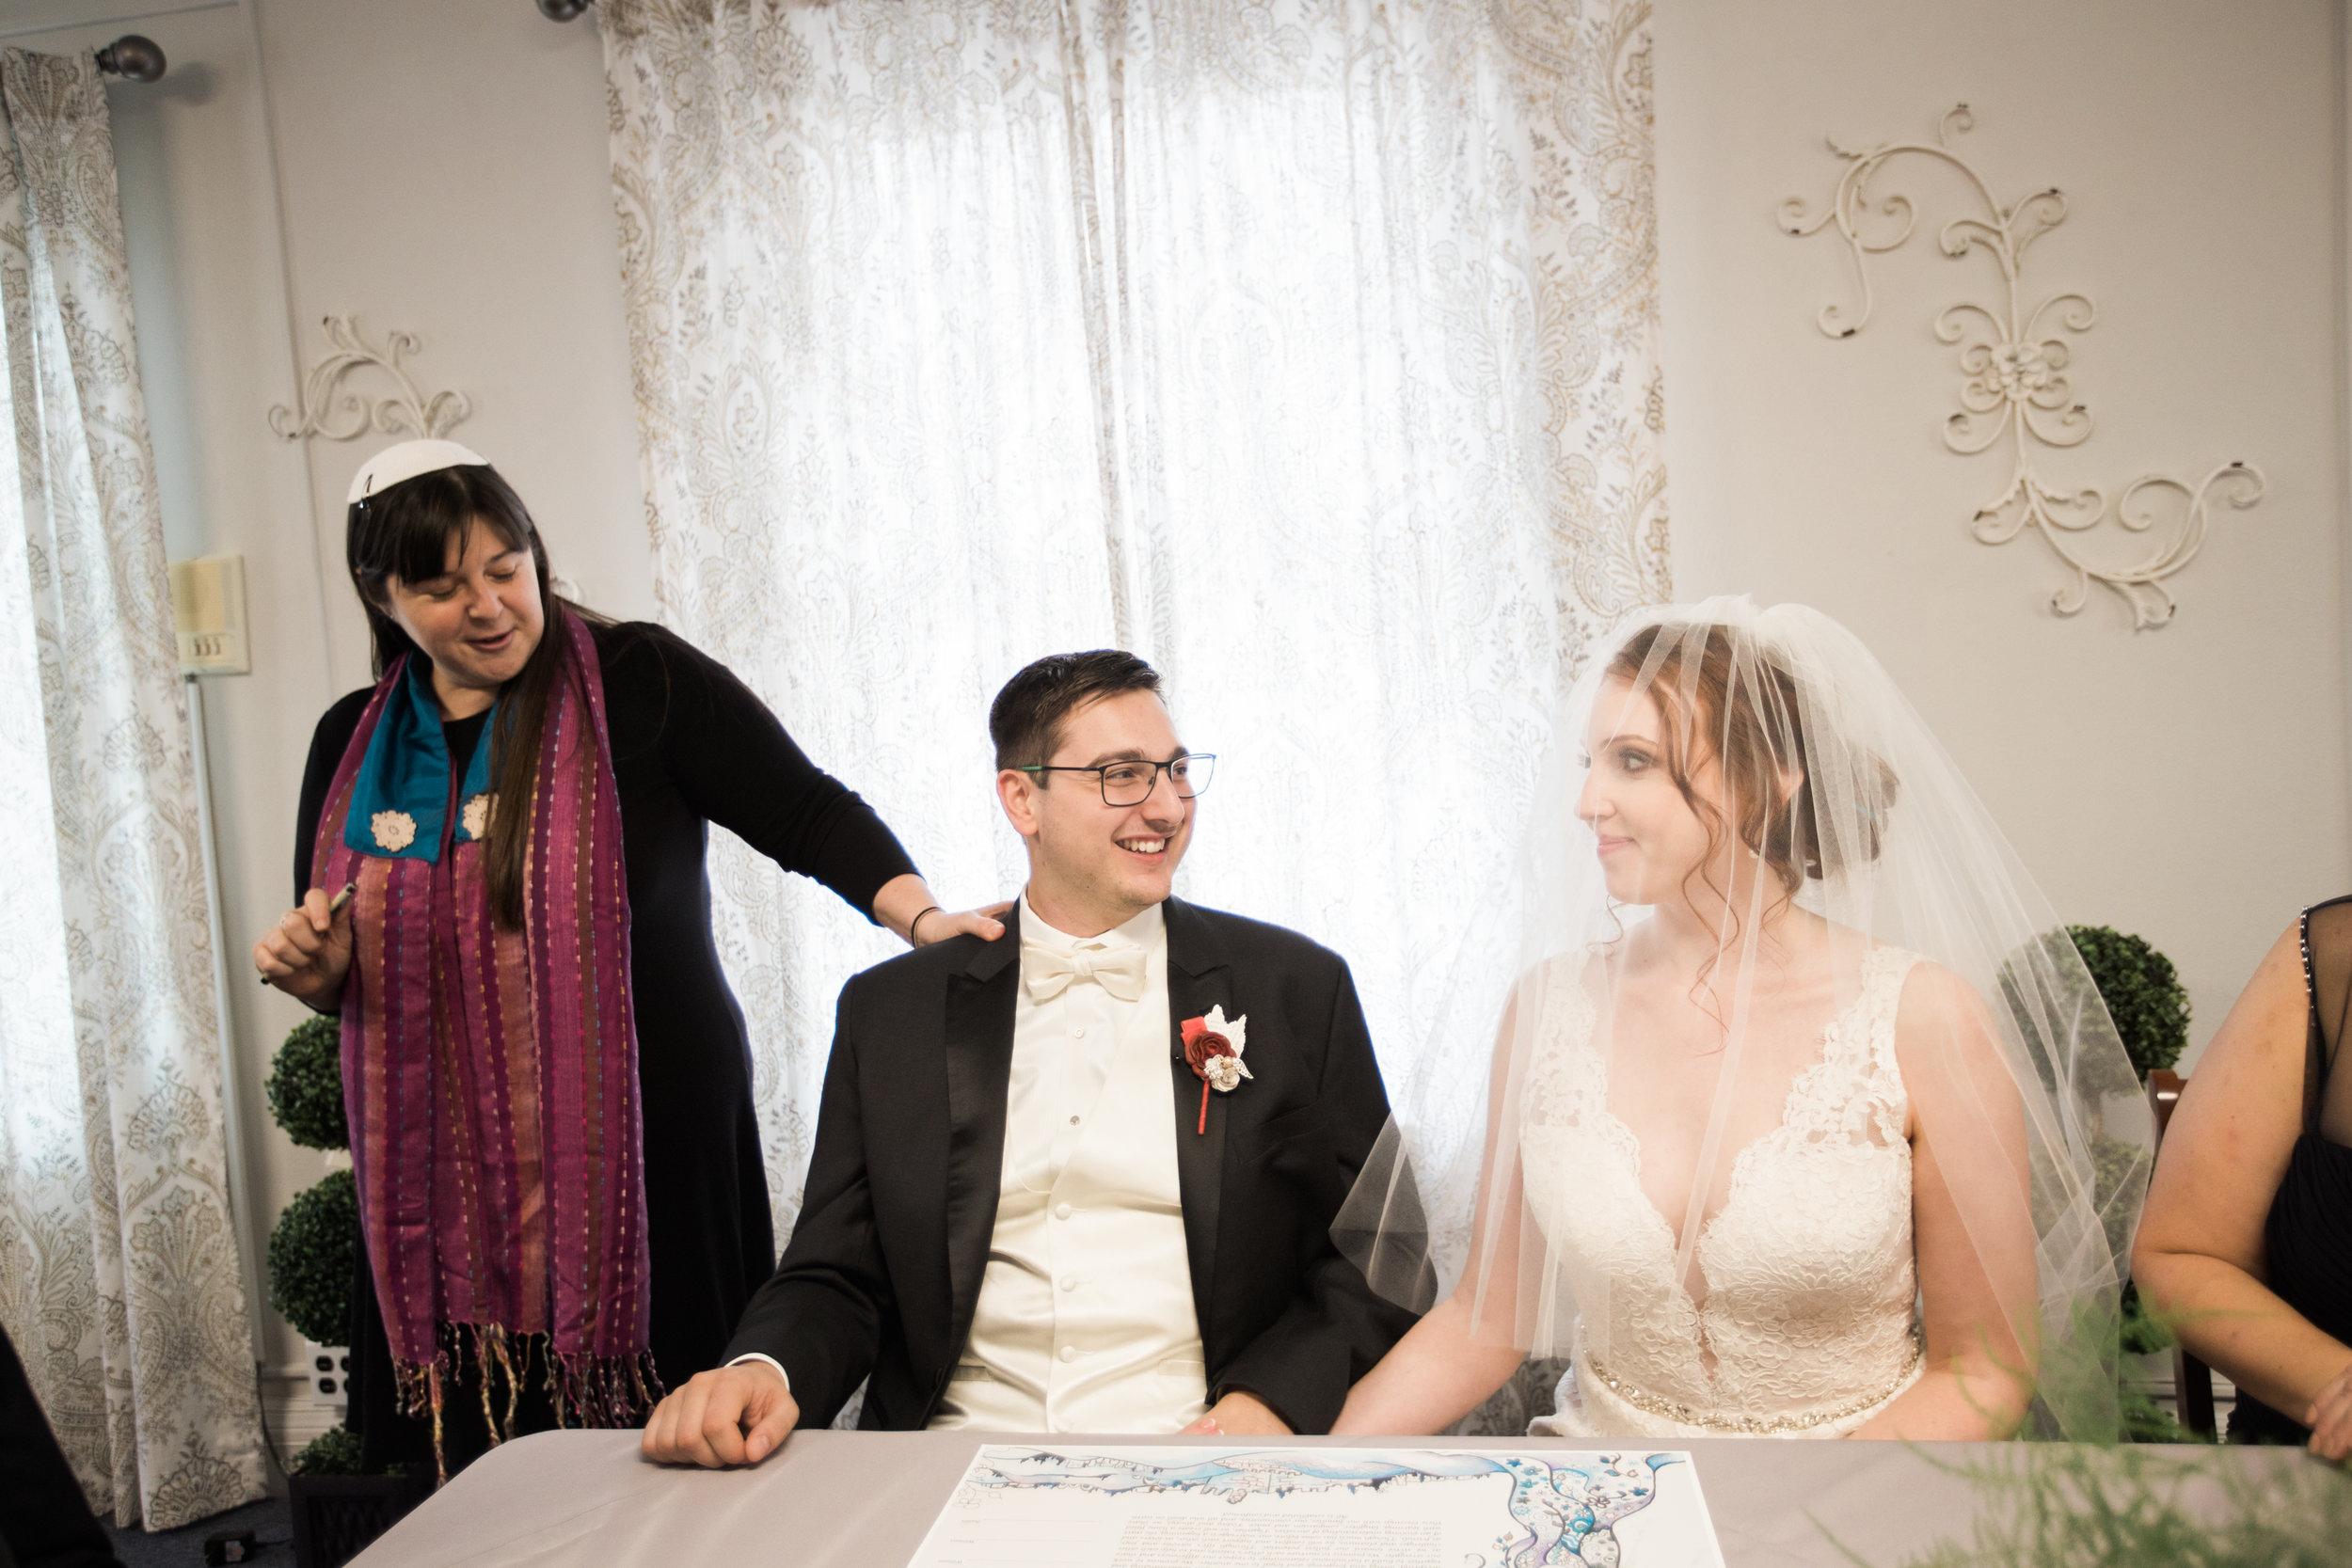 Harry Potter Wedding at Overhills Mansion Catonville Maryland Wedding Photographers Megapixels Media (62 of 134).jpg